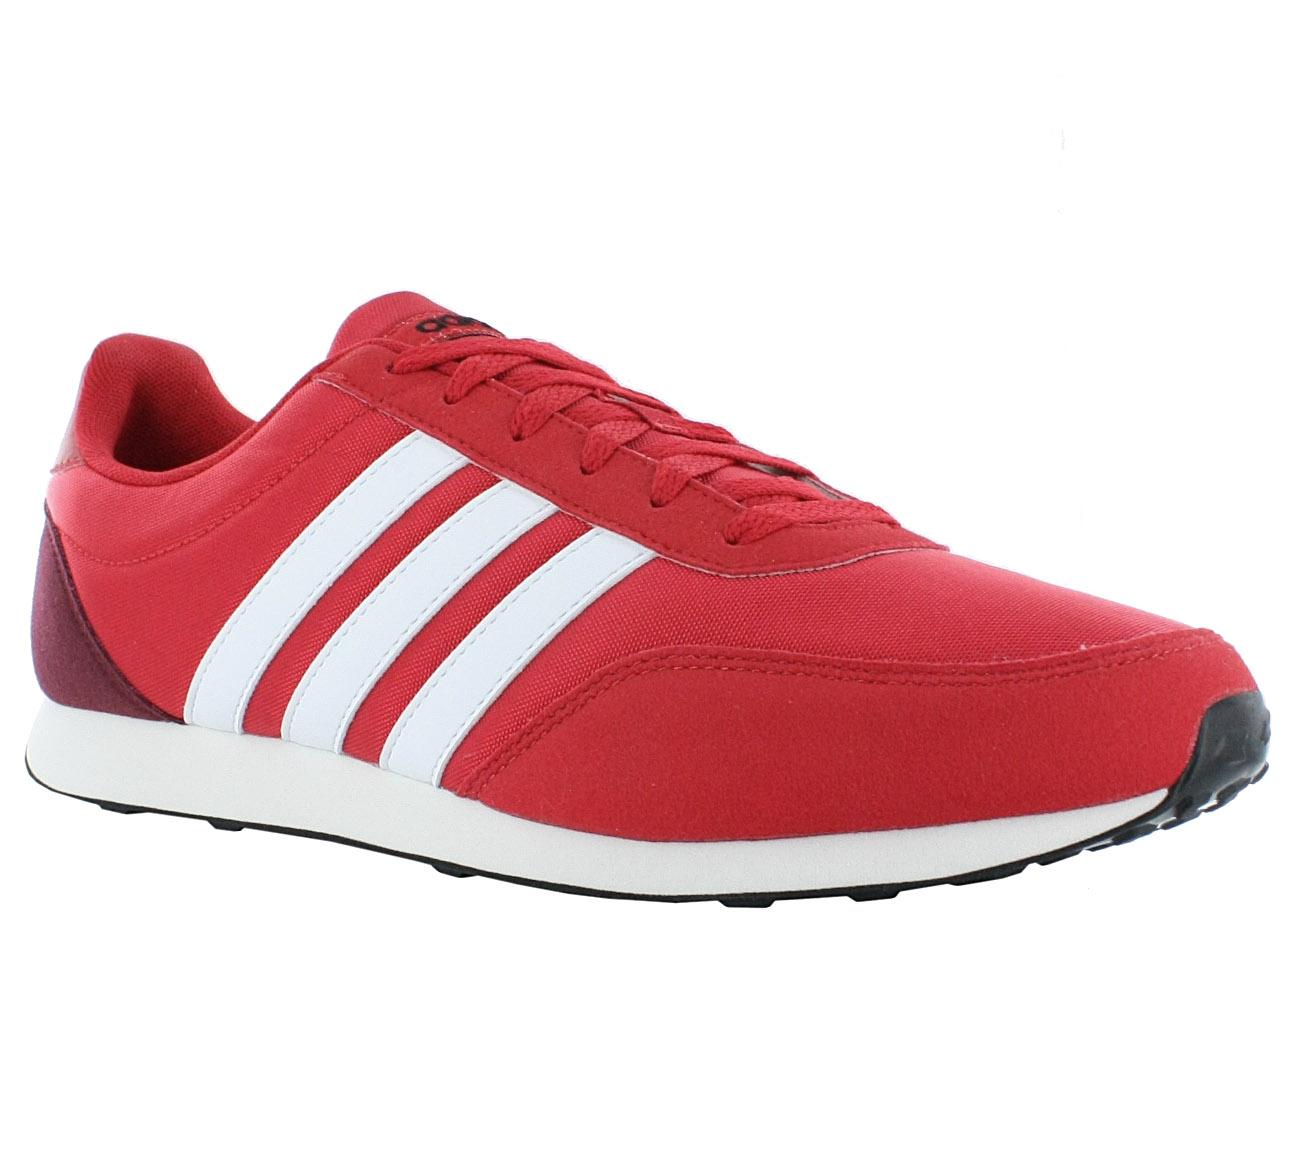 NEU adidas Racer 2.0  Rot caballeros  zapatos  Rot  BC0108 SALE ac96e1